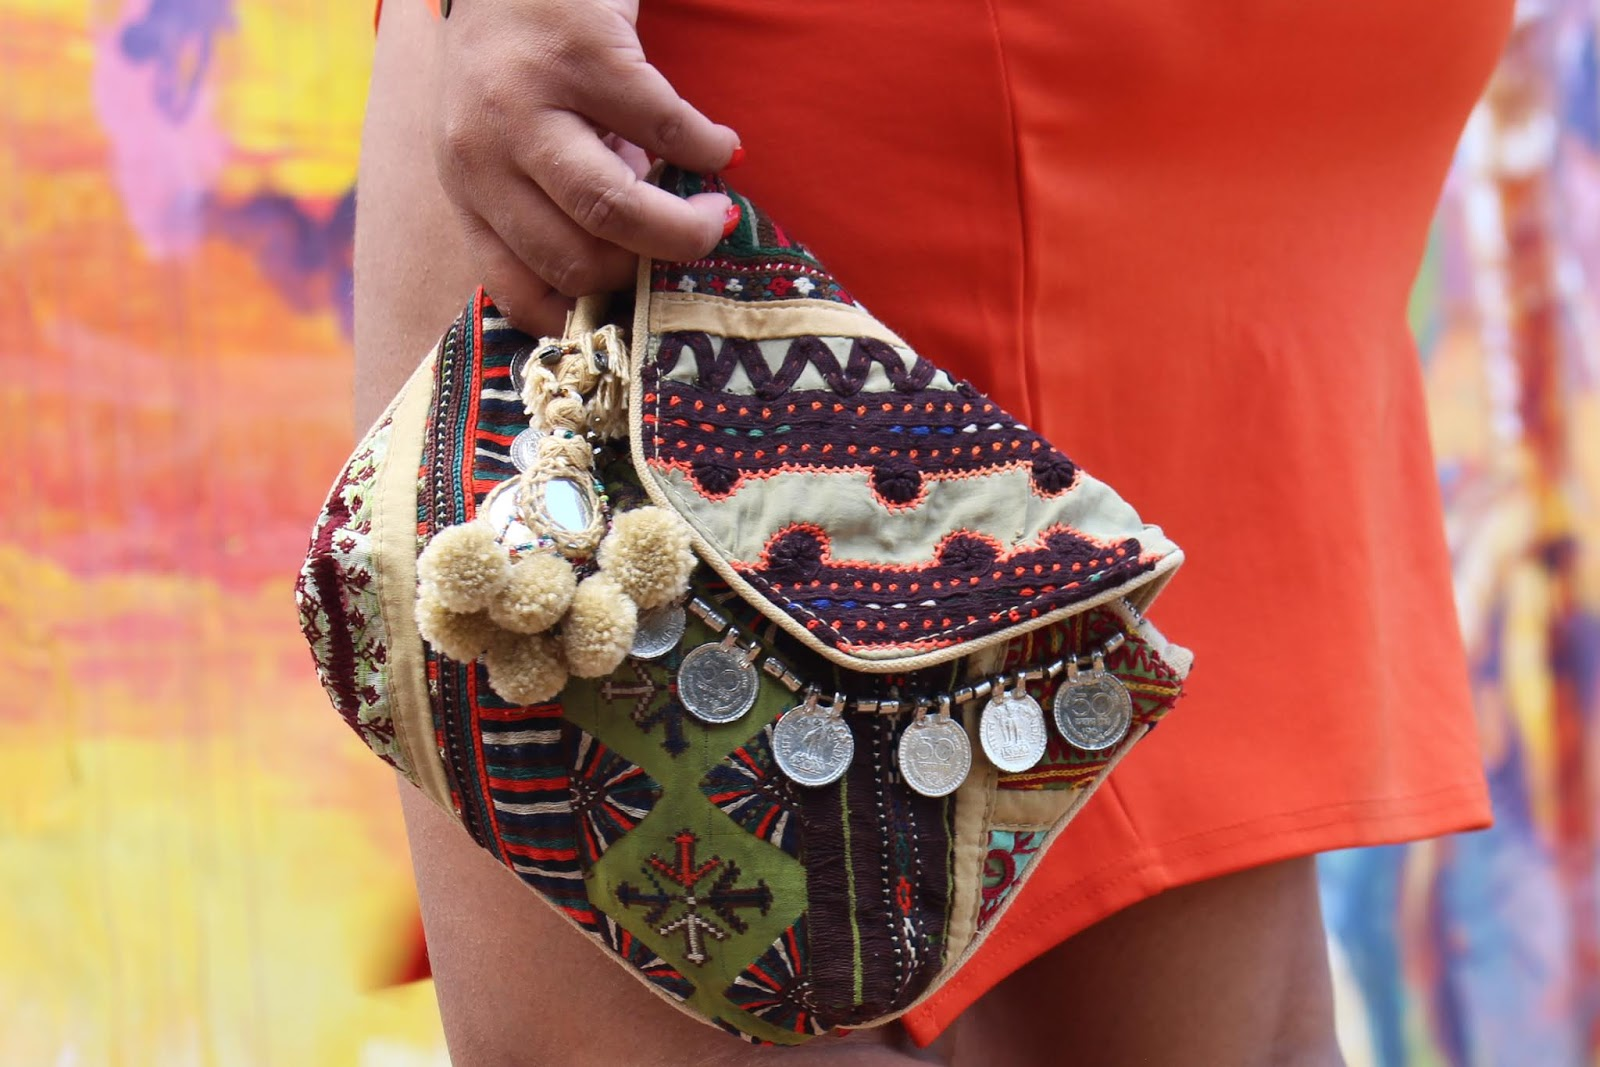 francis sling, sunu, curacao, ydk, mural, art, district, downtown, otrobanda, fashionblogger, travel blogger